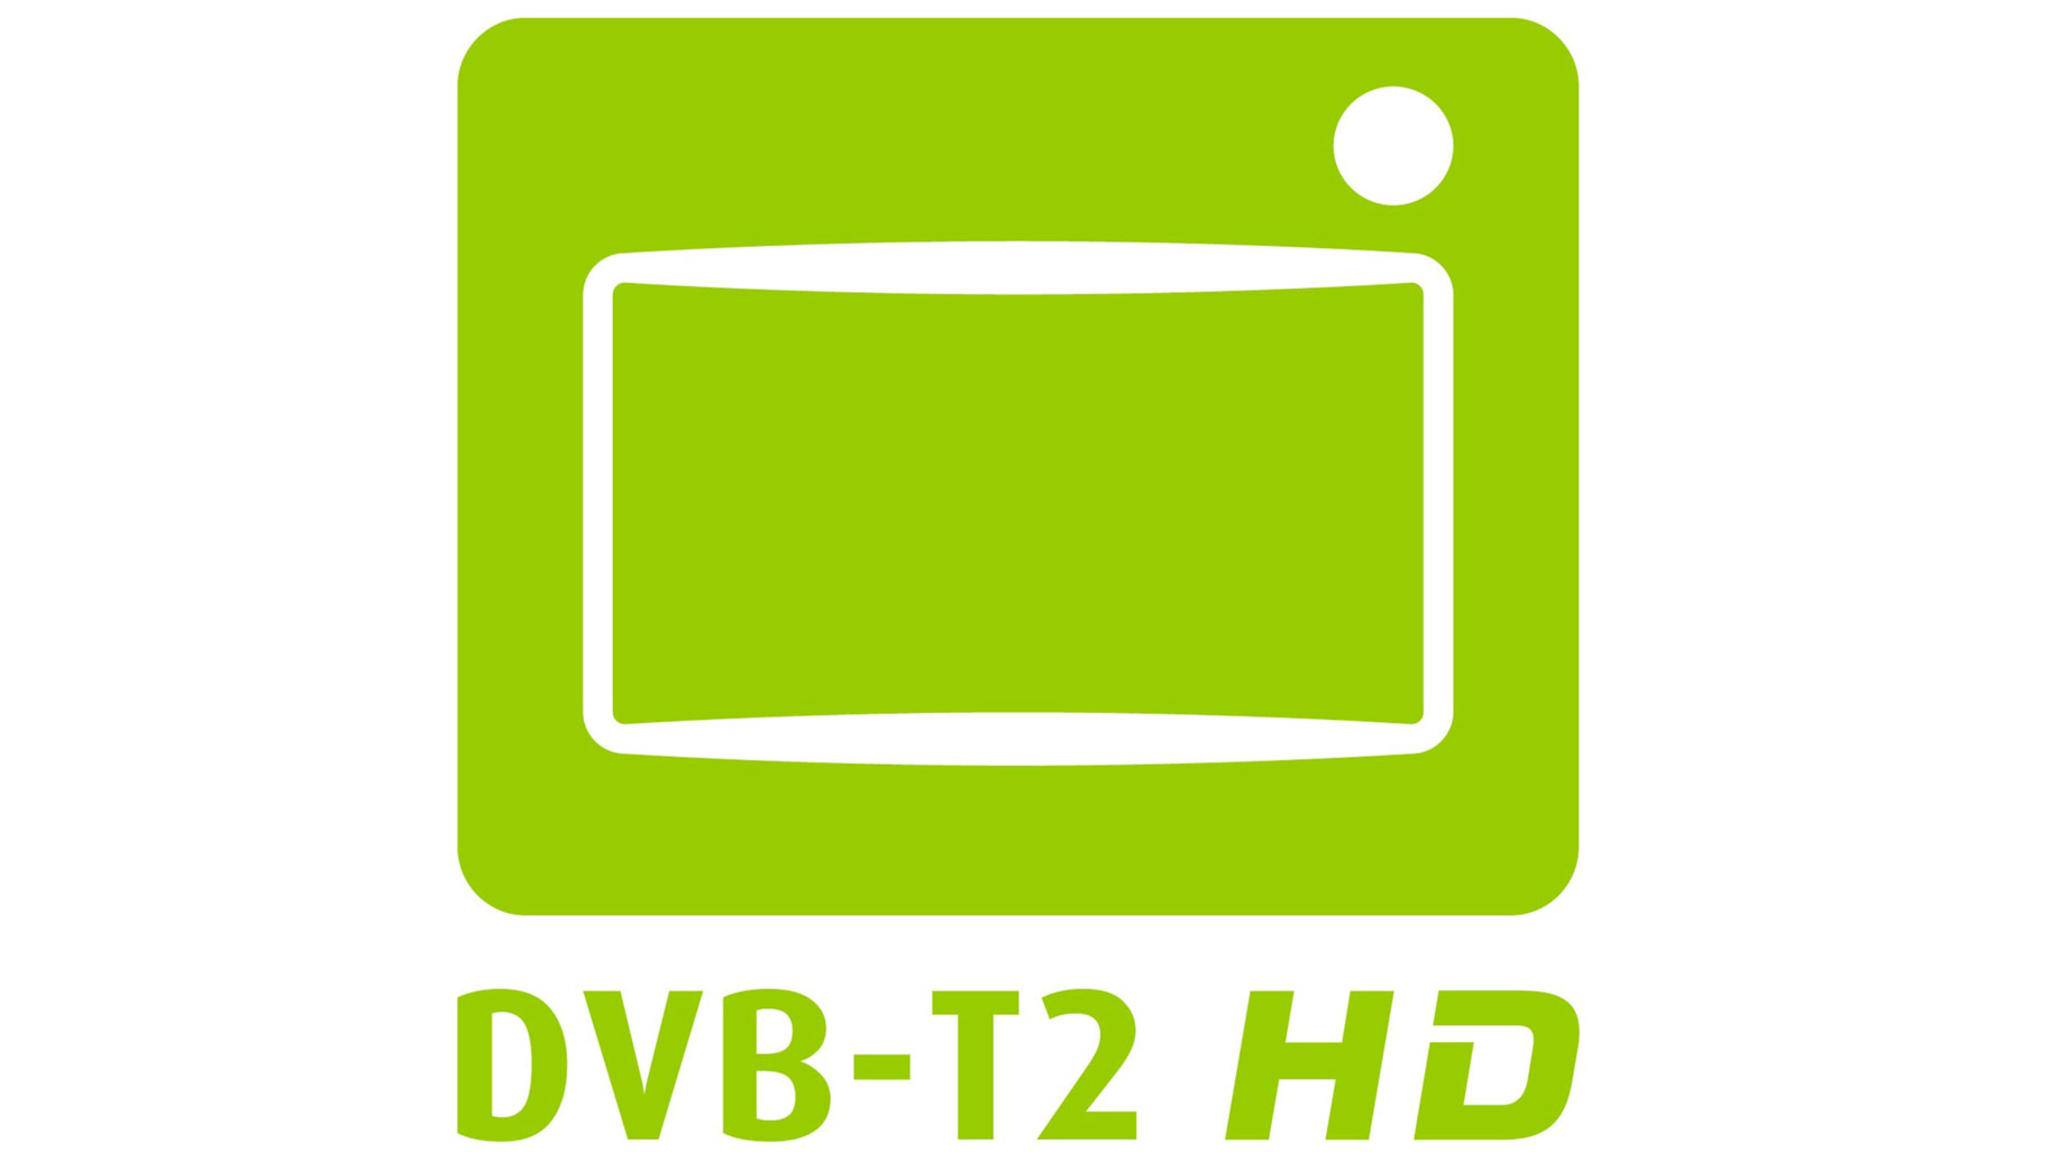 vor und nachteile fernsehen per kabel sat iptv dvb t2 hd. Black Bedroom Furniture Sets. Home Design Ideas